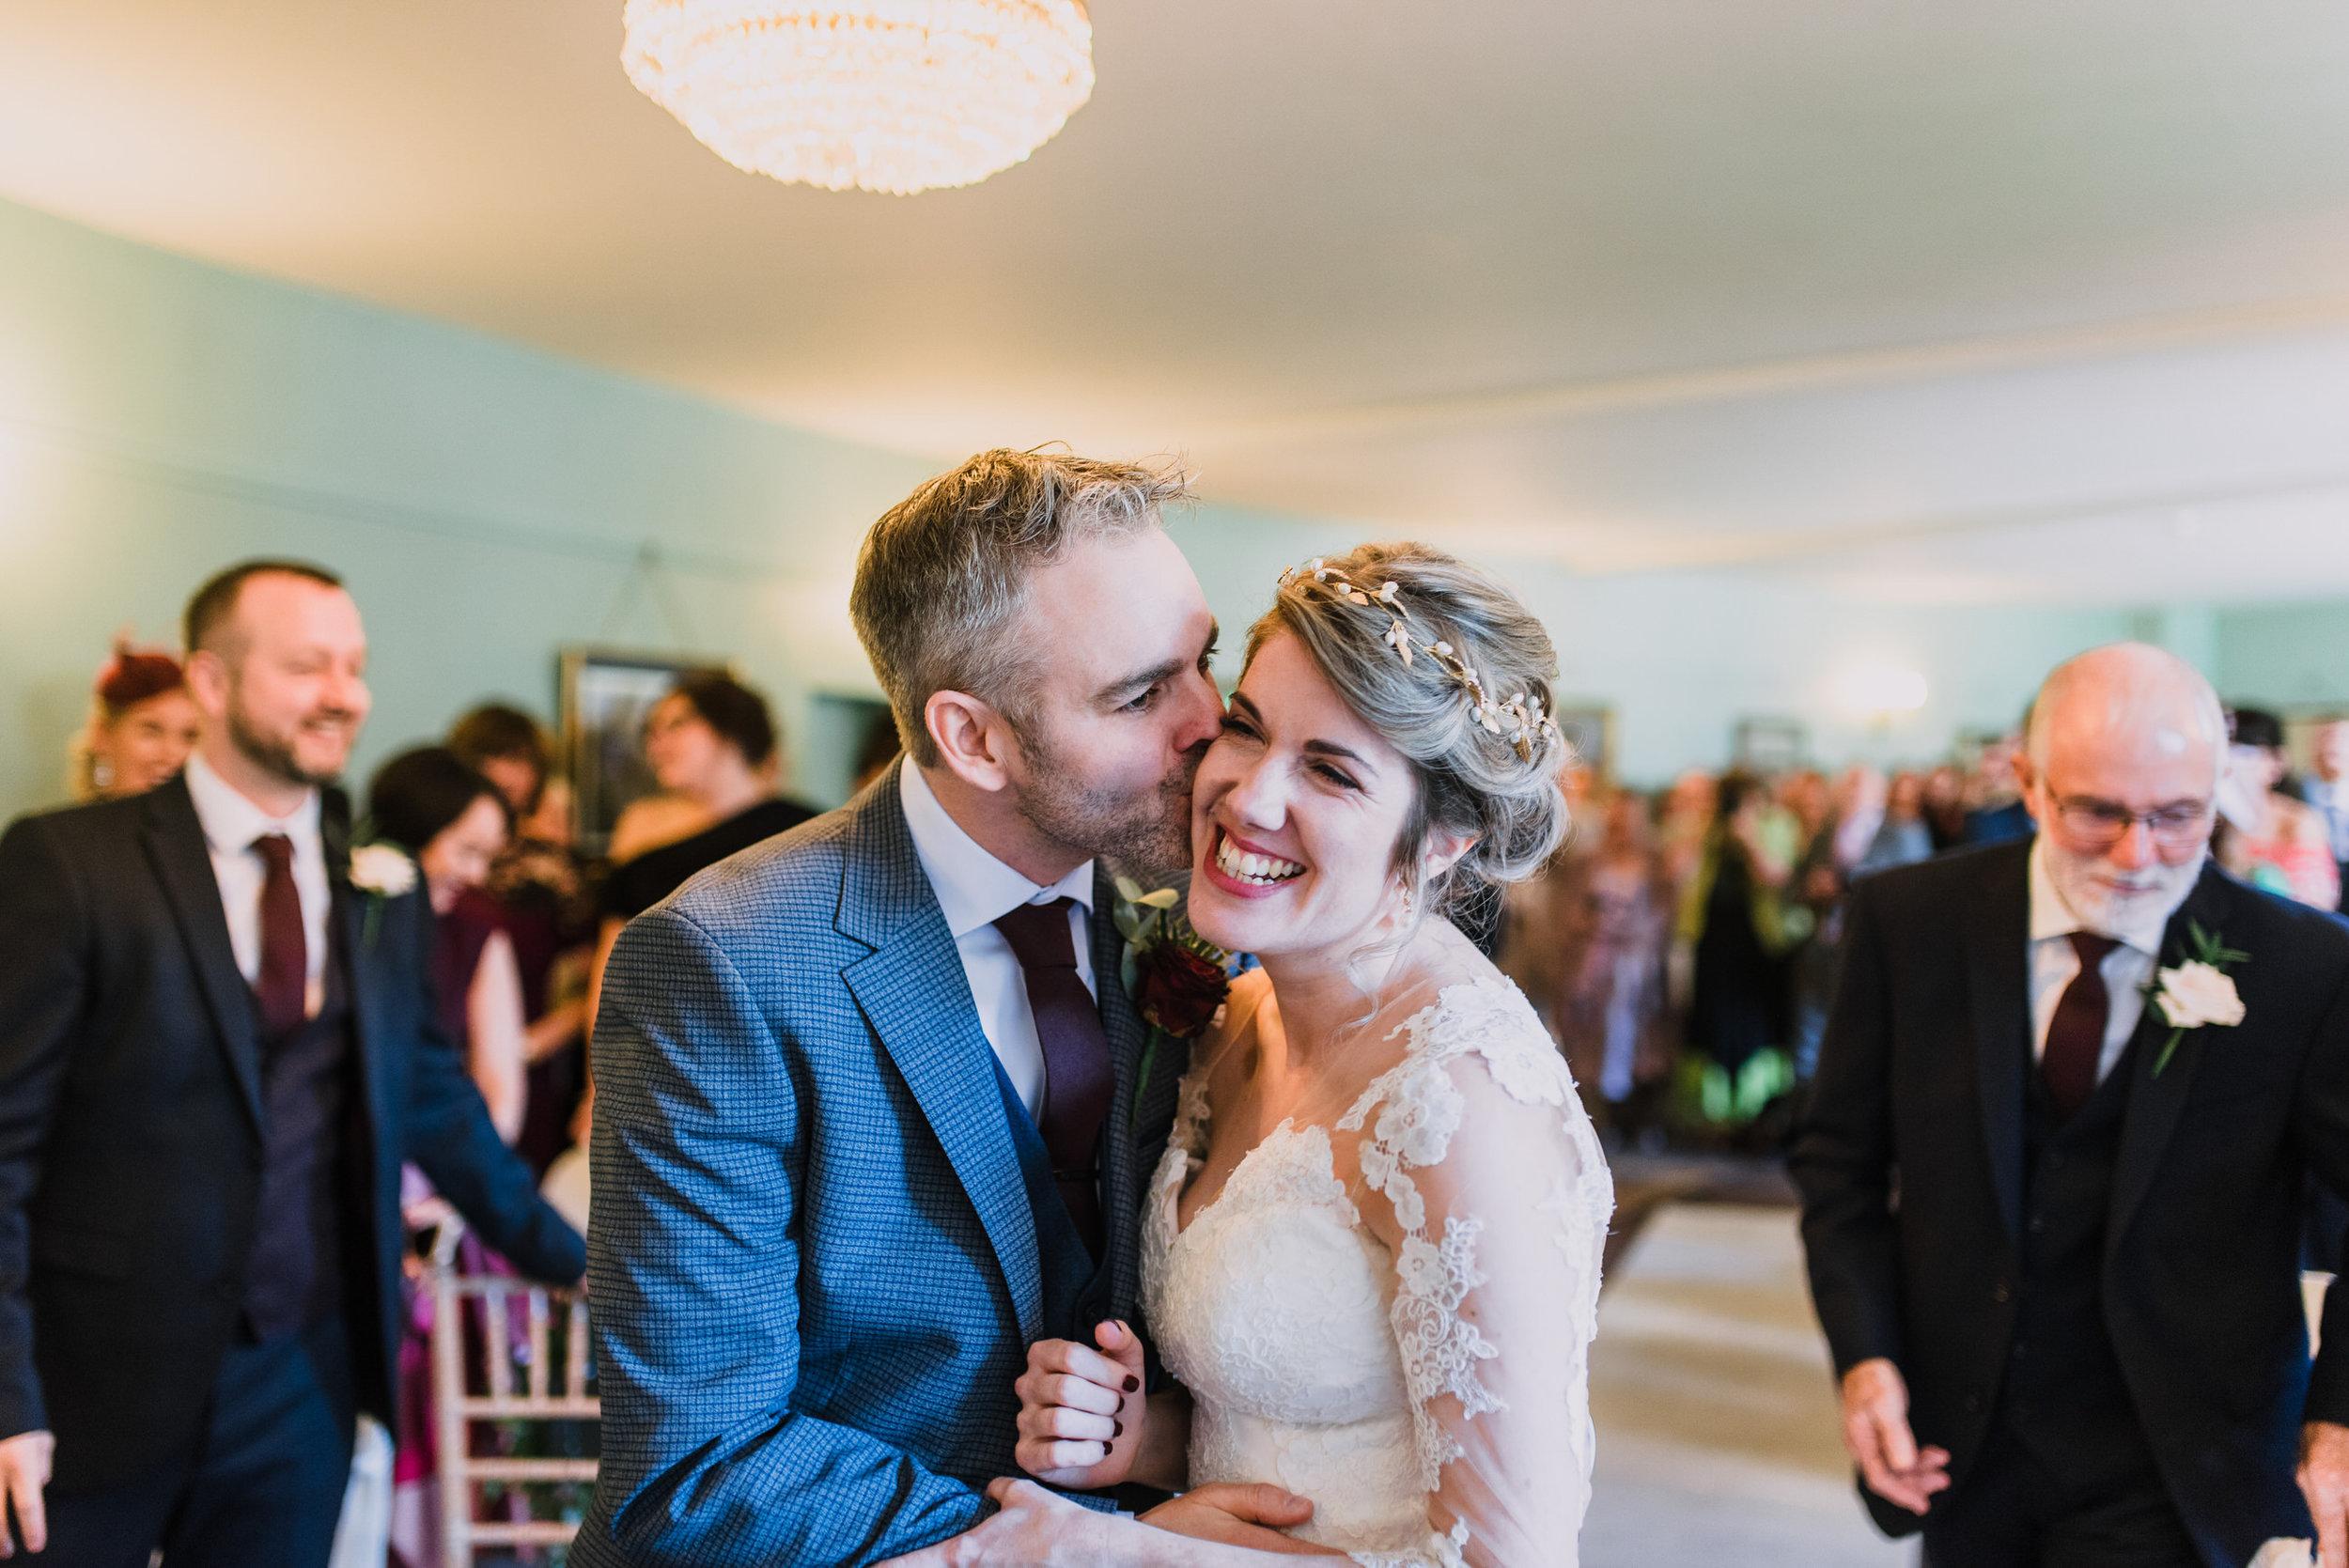 lissanoure castle wedding, northern ireland wedding photographer, romantic northern irish wedding venue, castle wedding ireland, natural wedding photography ni (59).jpg